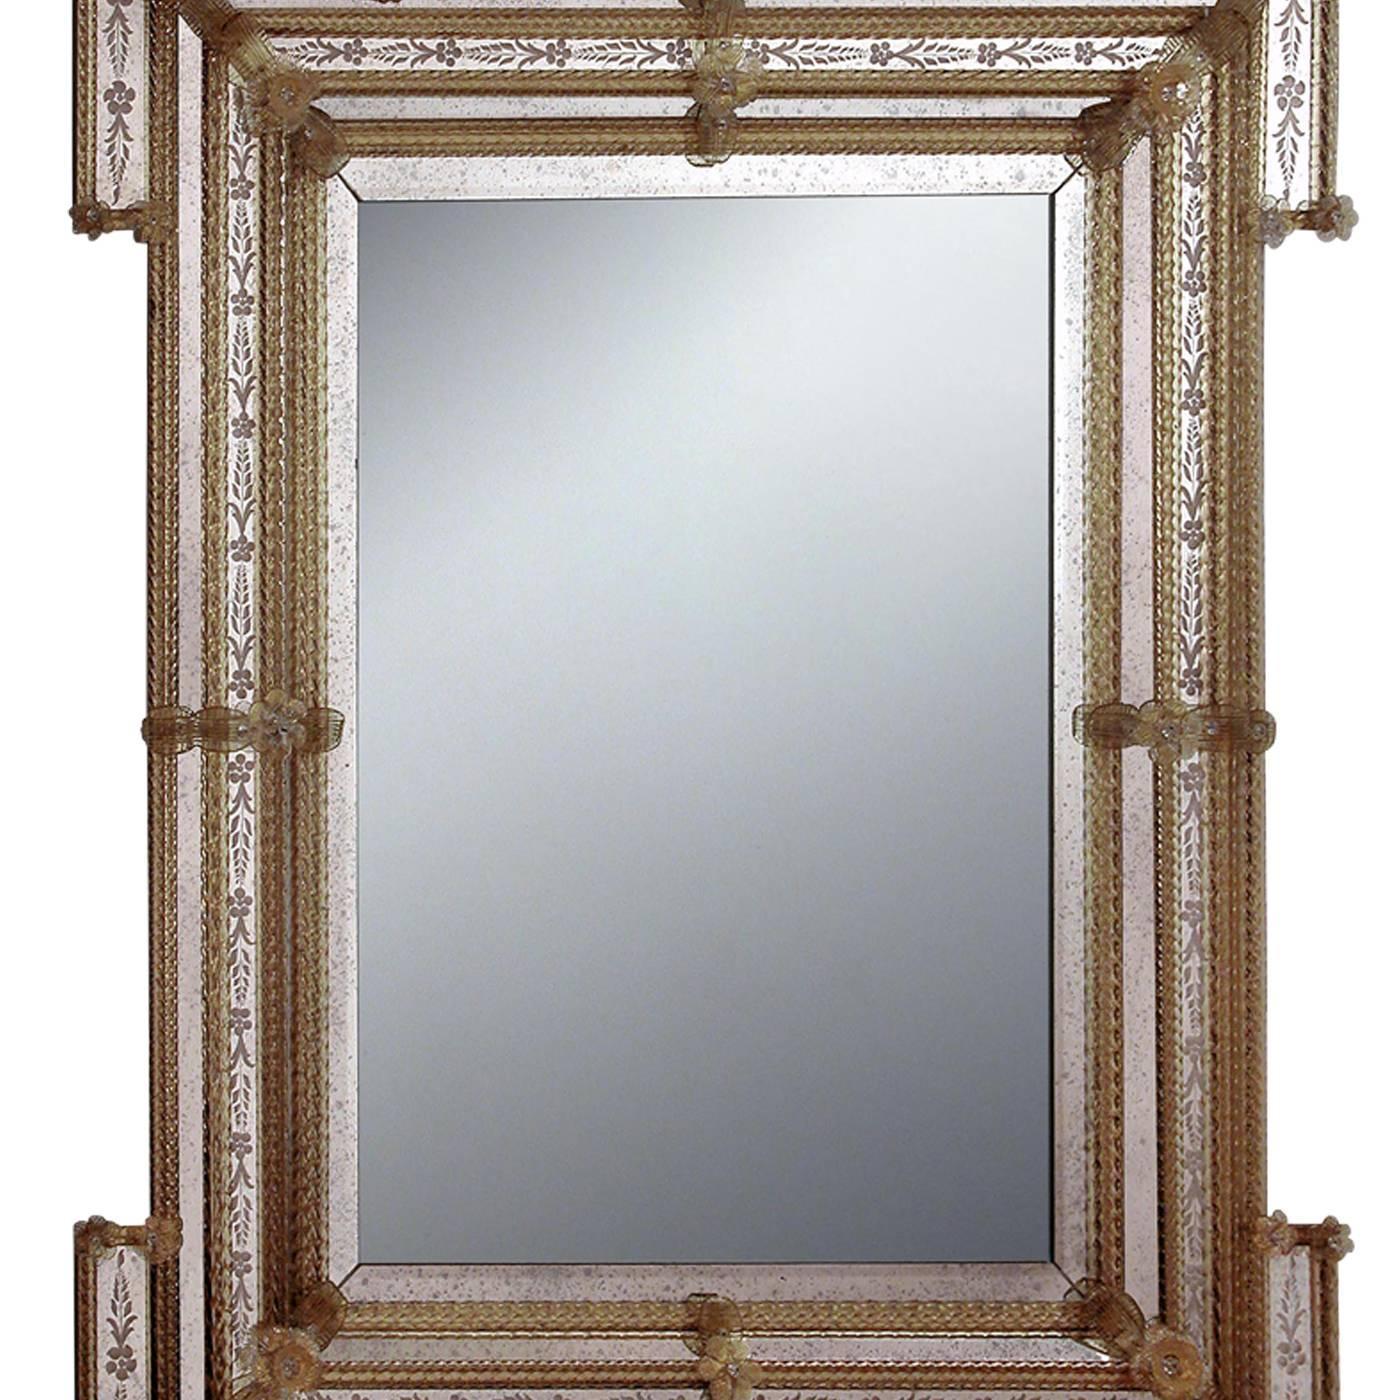 Rob murano glass mirror for sale at 1stdibs for Loft via savona 97